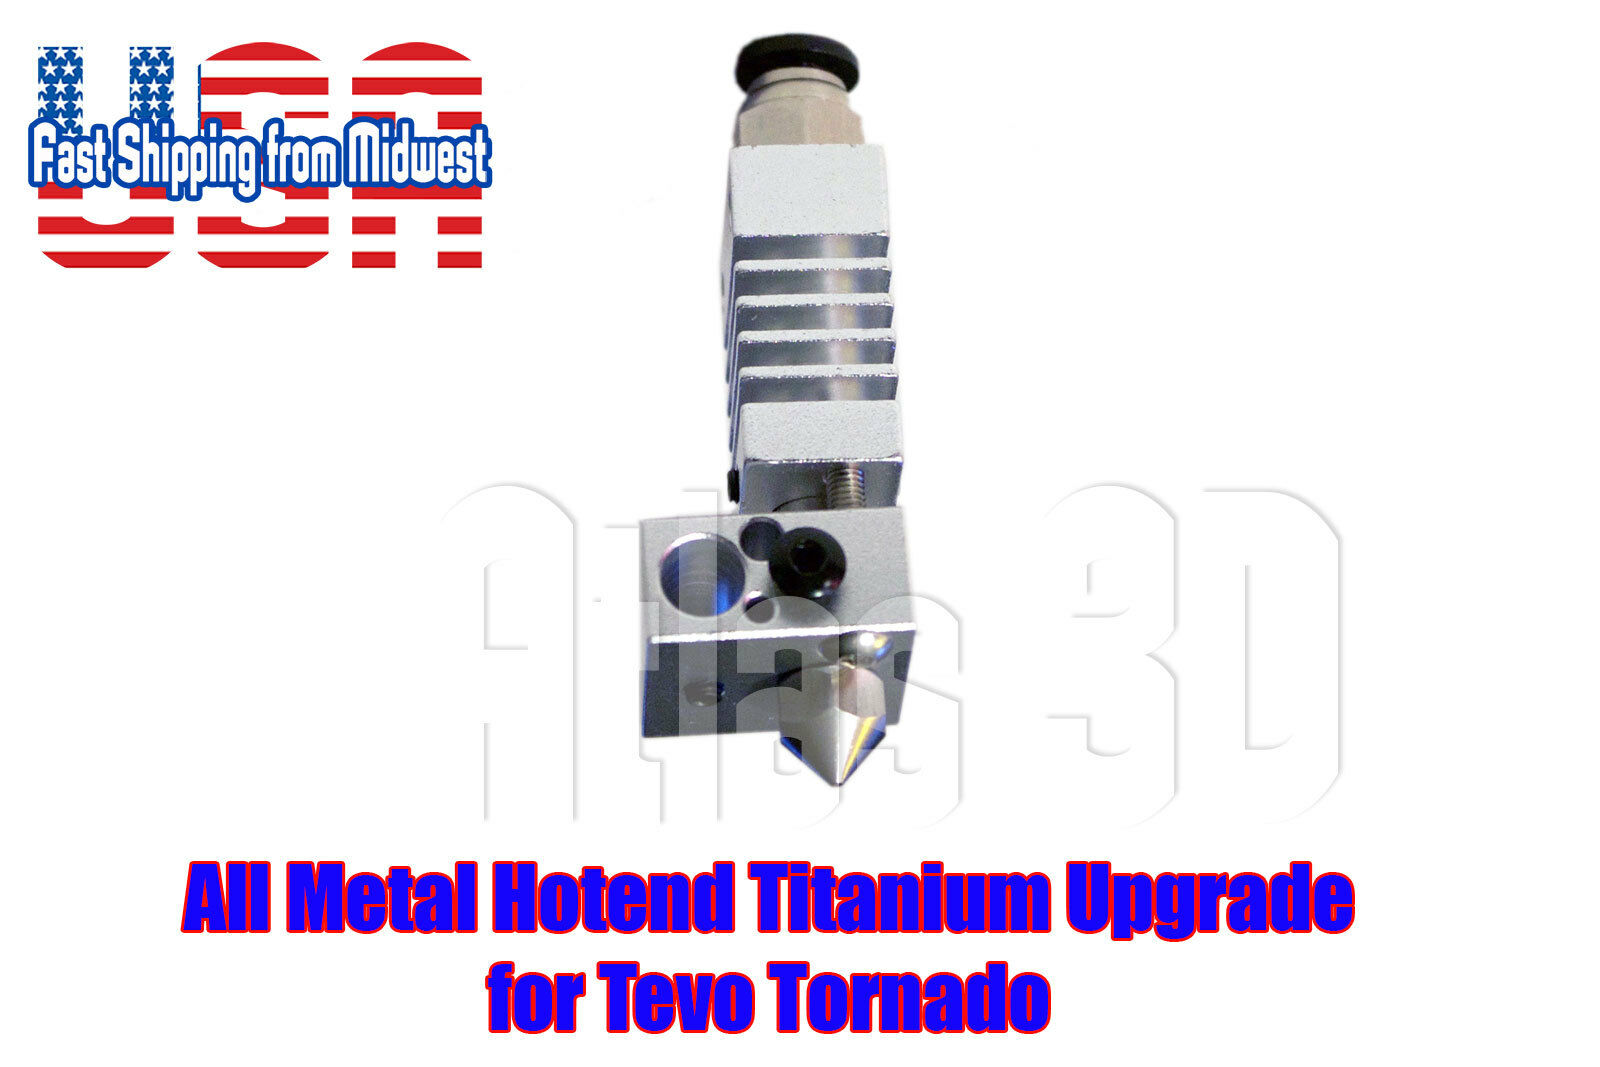 Tevo Tornado All Metal Hotend with Titanium Heat Break, 1.75, 3D Printer, 24v